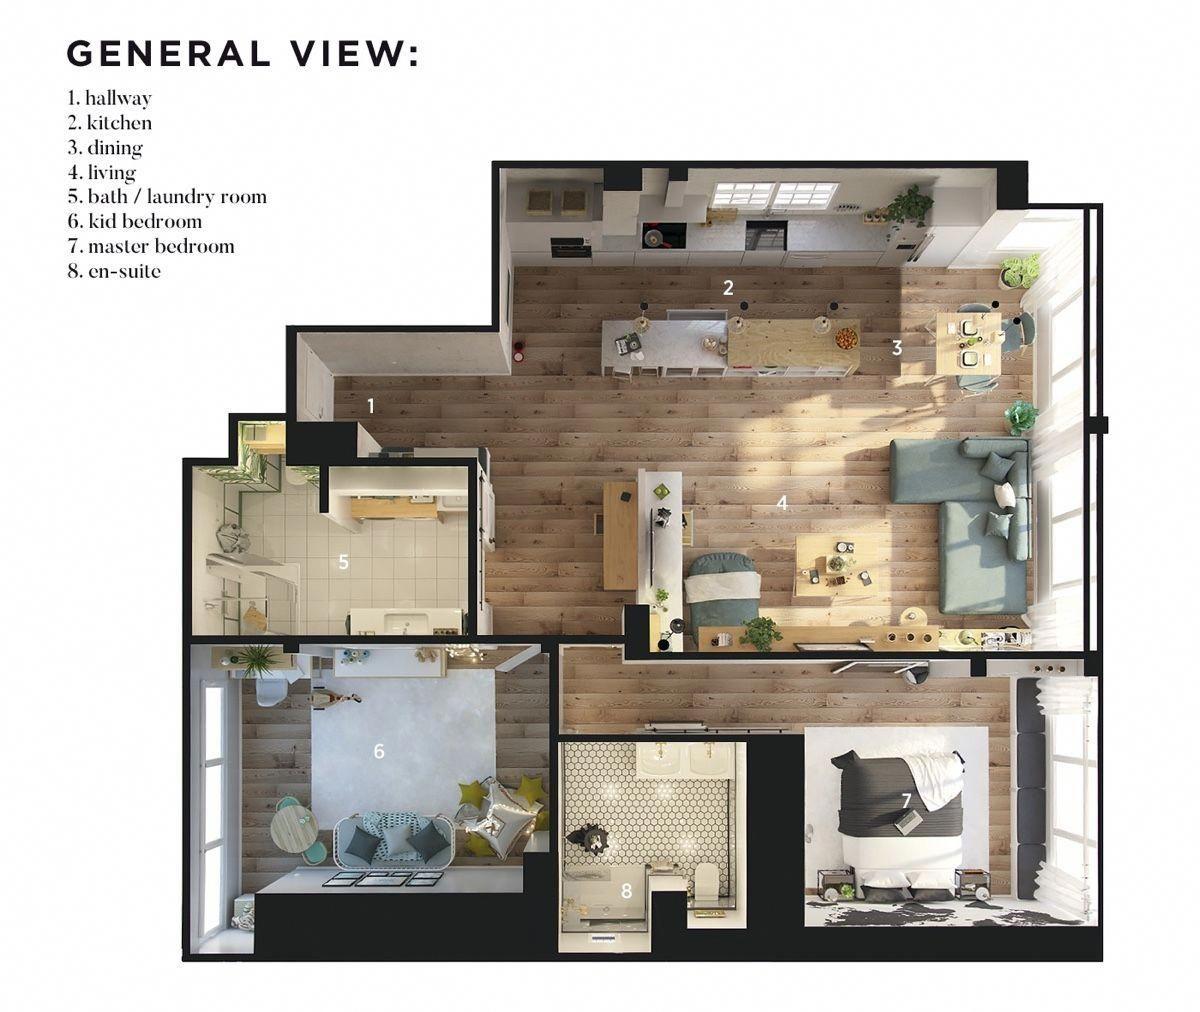 7-Bedroom Modern Apartment Design Under 7 Square Meters: 7 Great